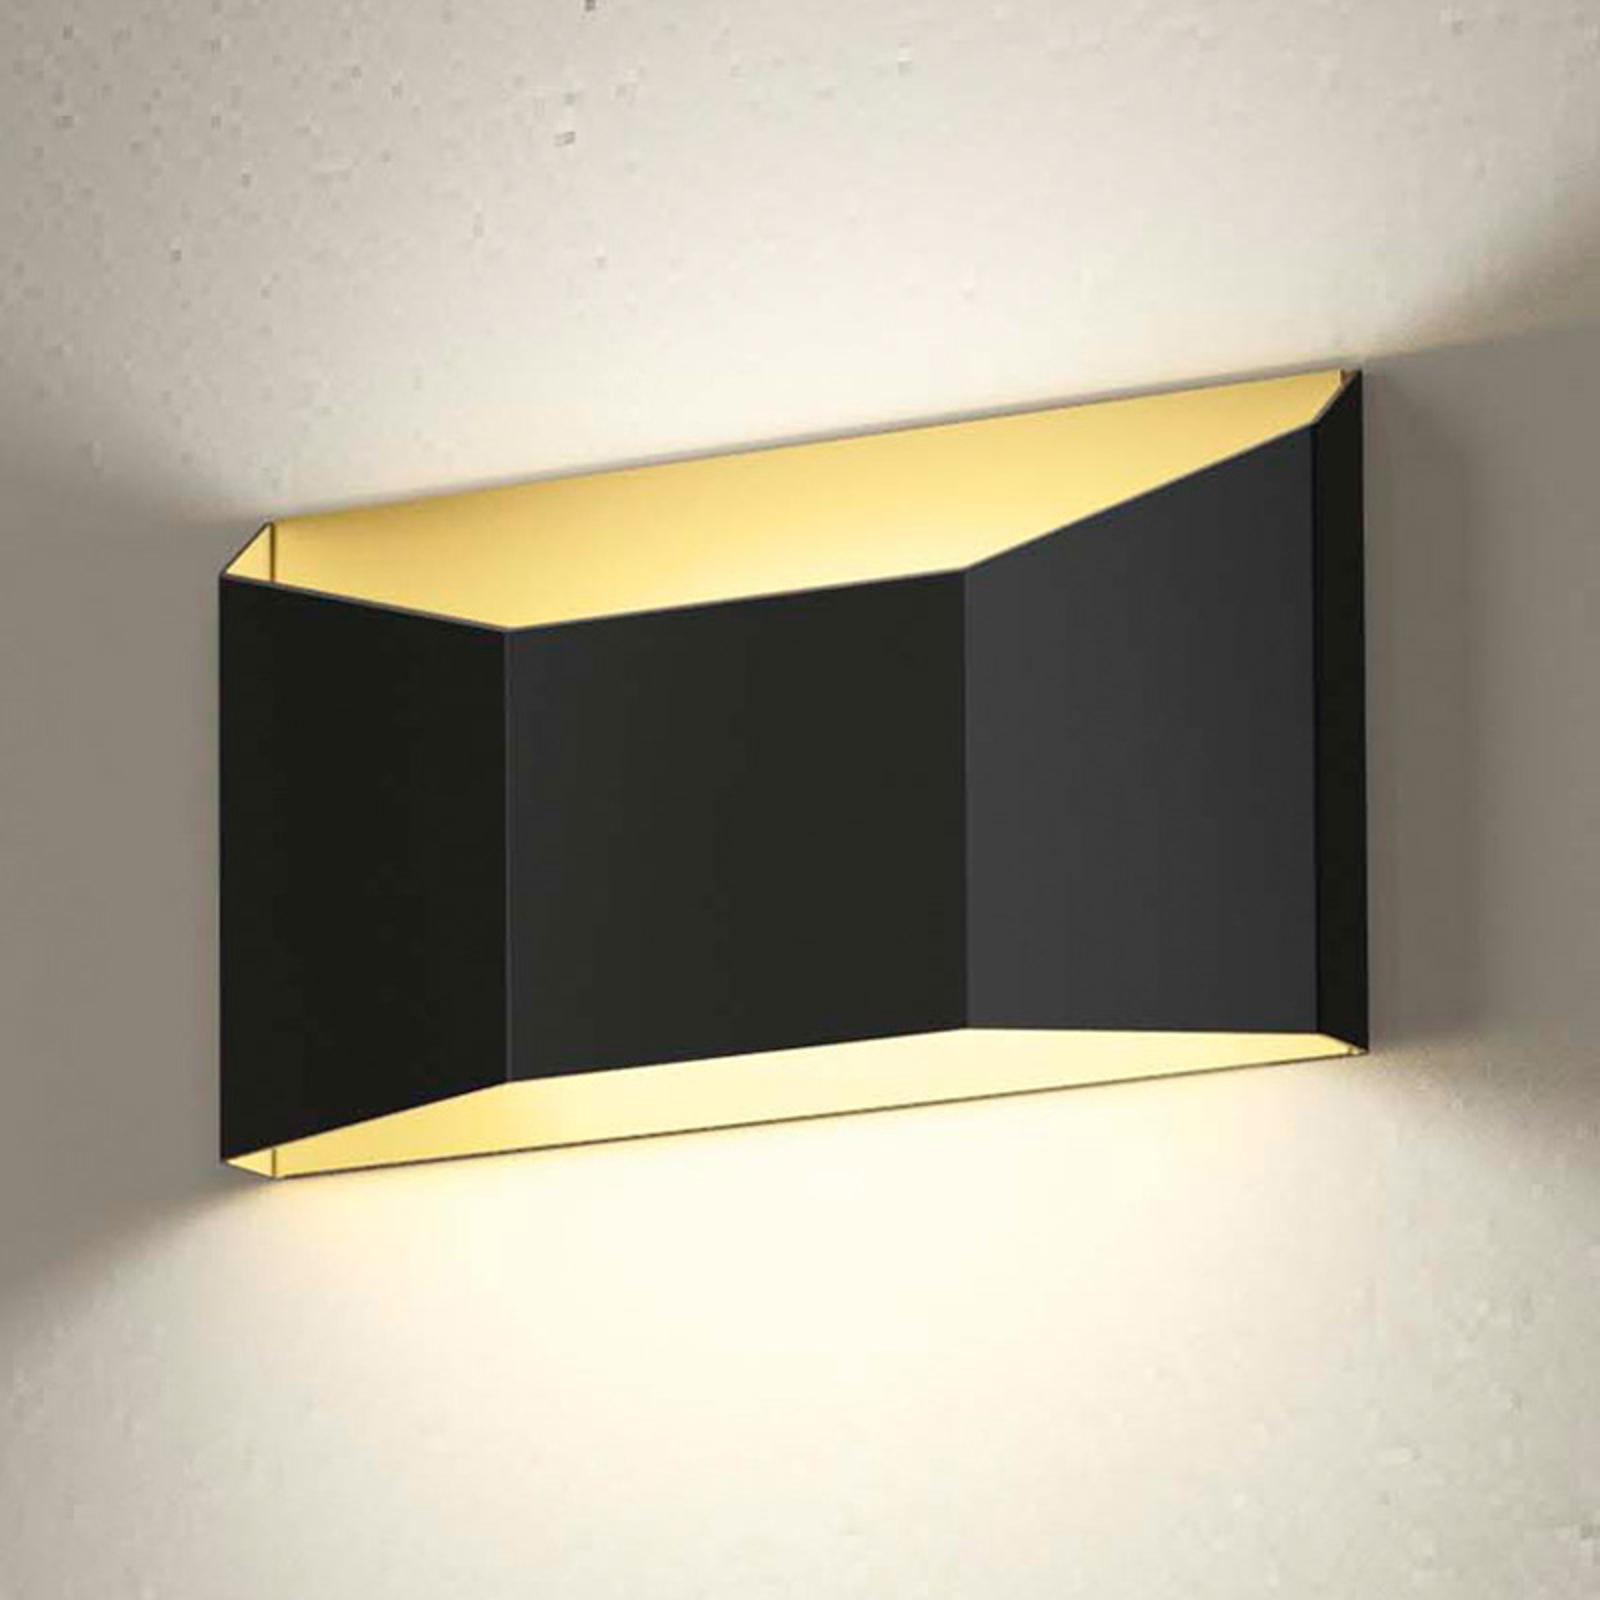 Zweifarbige LED-Wandleuchte Esa in flacher Form